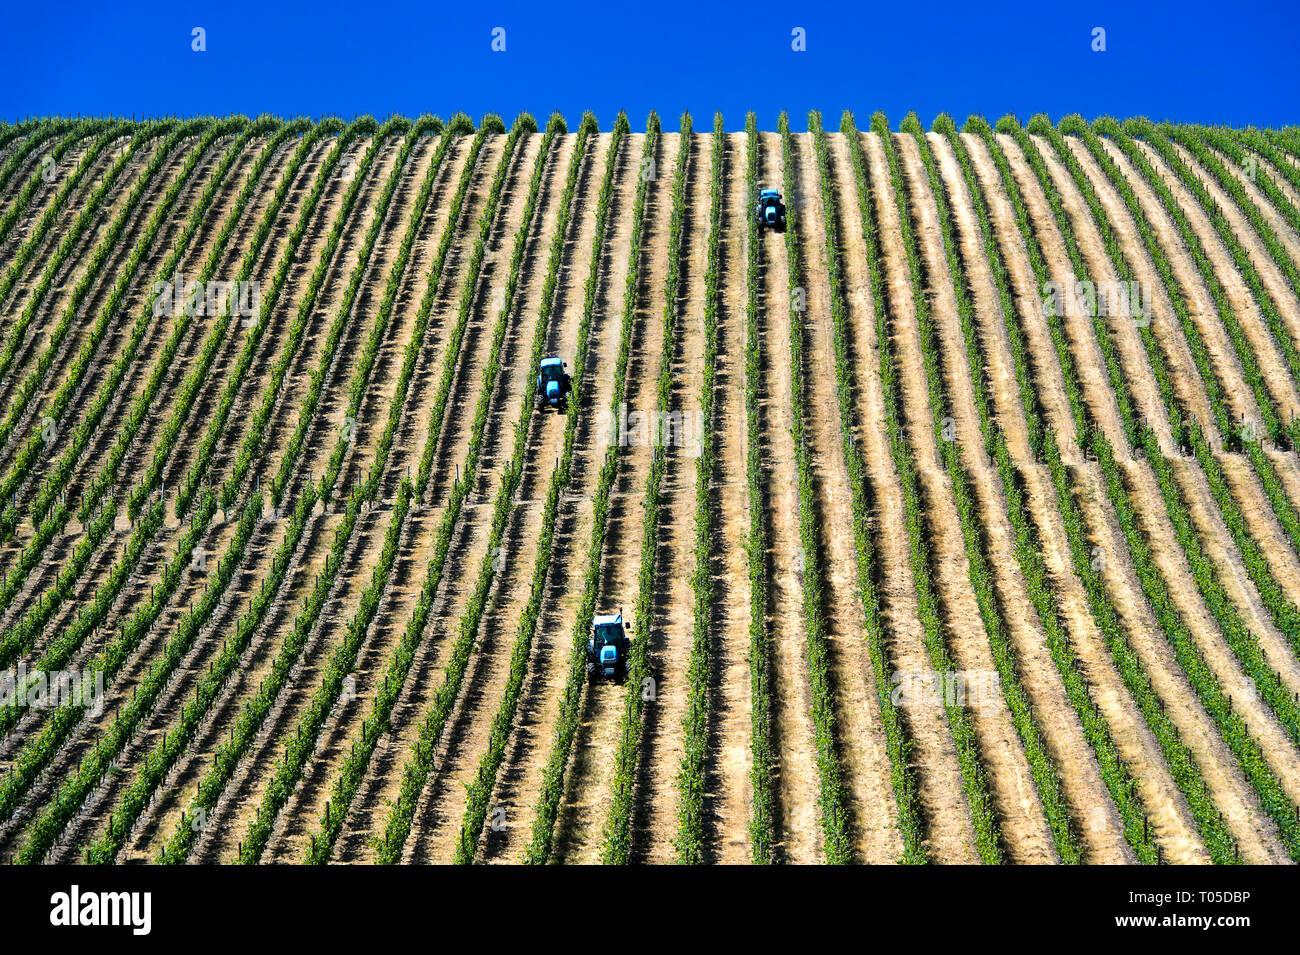 Mechanized fieldwork with tractor in Vineyard with vertical vine rows, Vinha ao alto technique, Sao Joao de Pesqueira, Douro Valley, Portugal - Stock Image